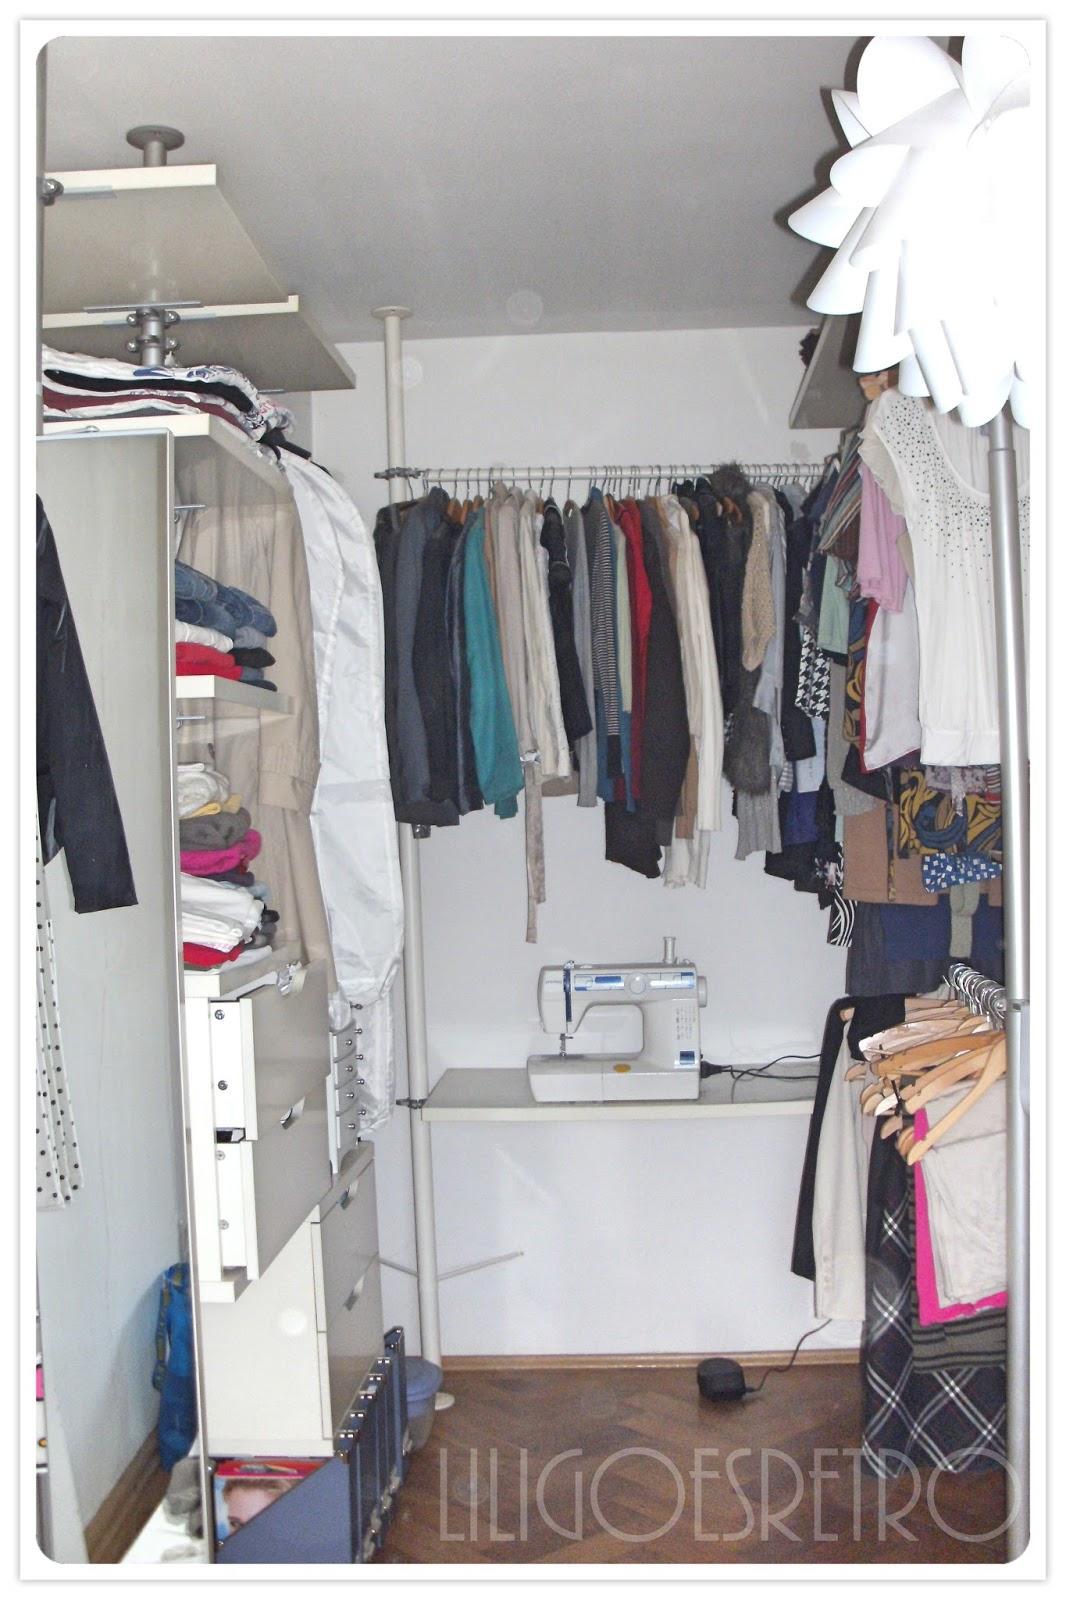 lili goes retro das projekt kleiderschrank. Black Bedroom Furniture Sets. Home Design Ideas